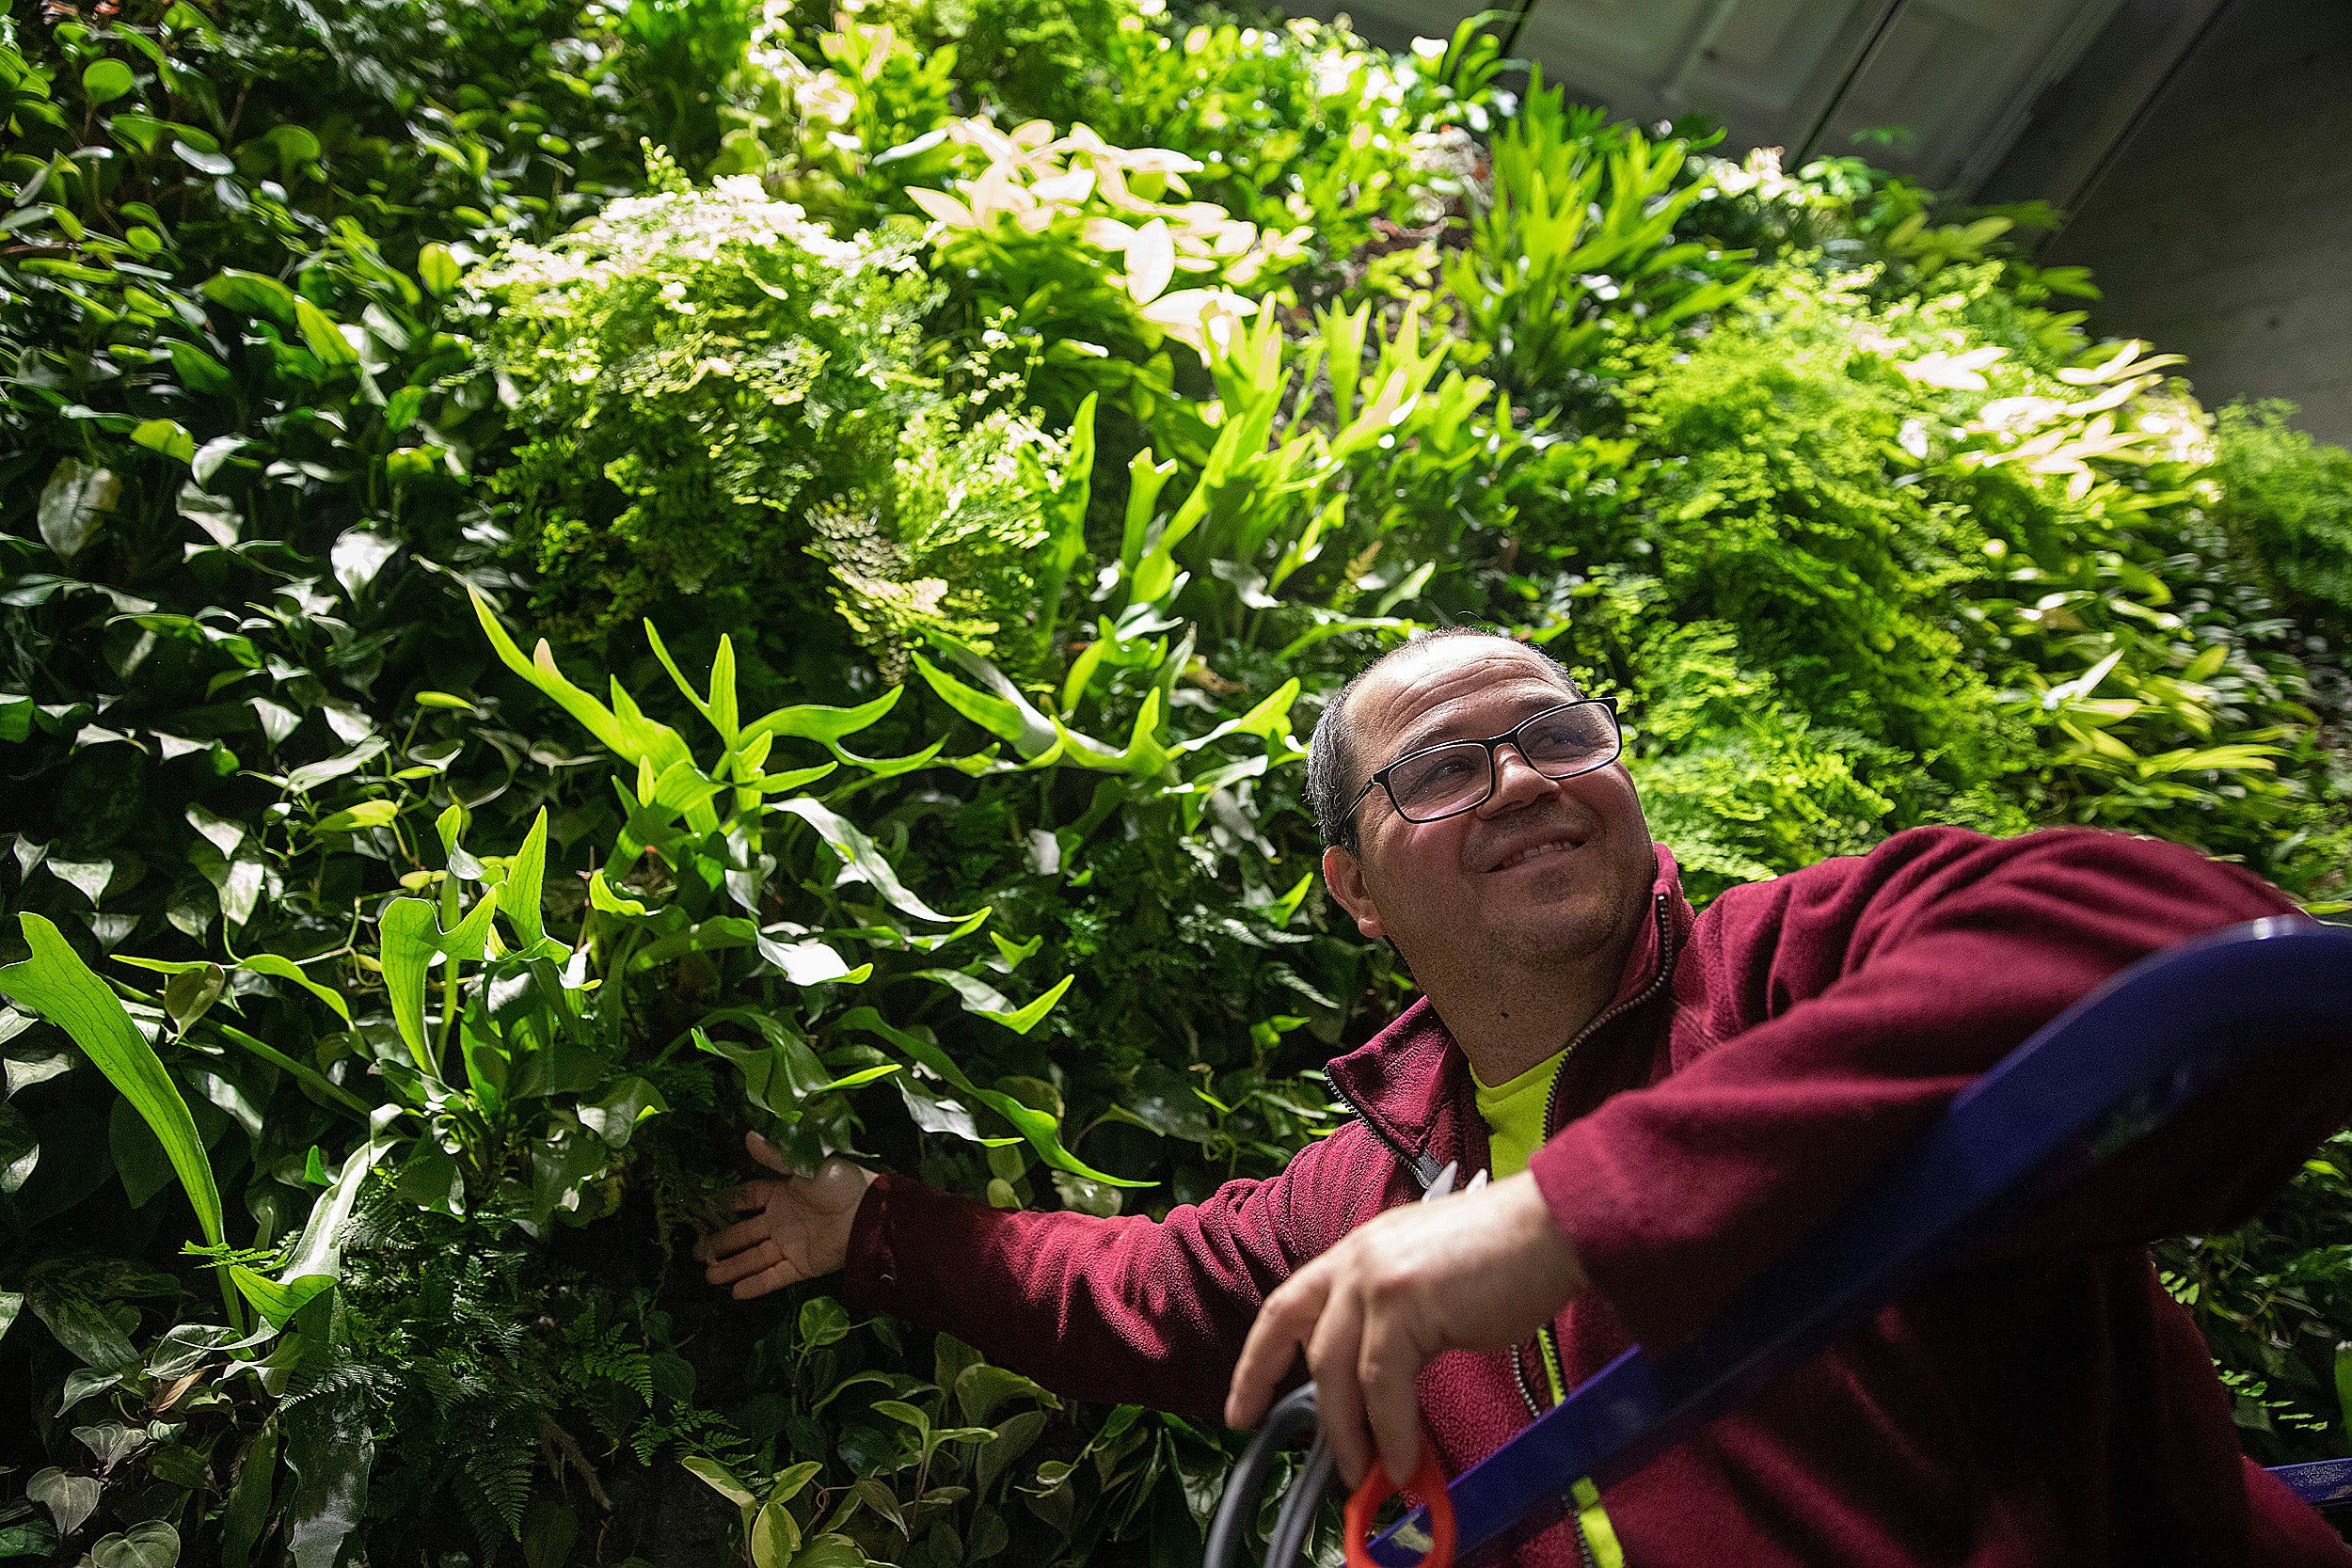 Tiago Peraira tending to the green wall